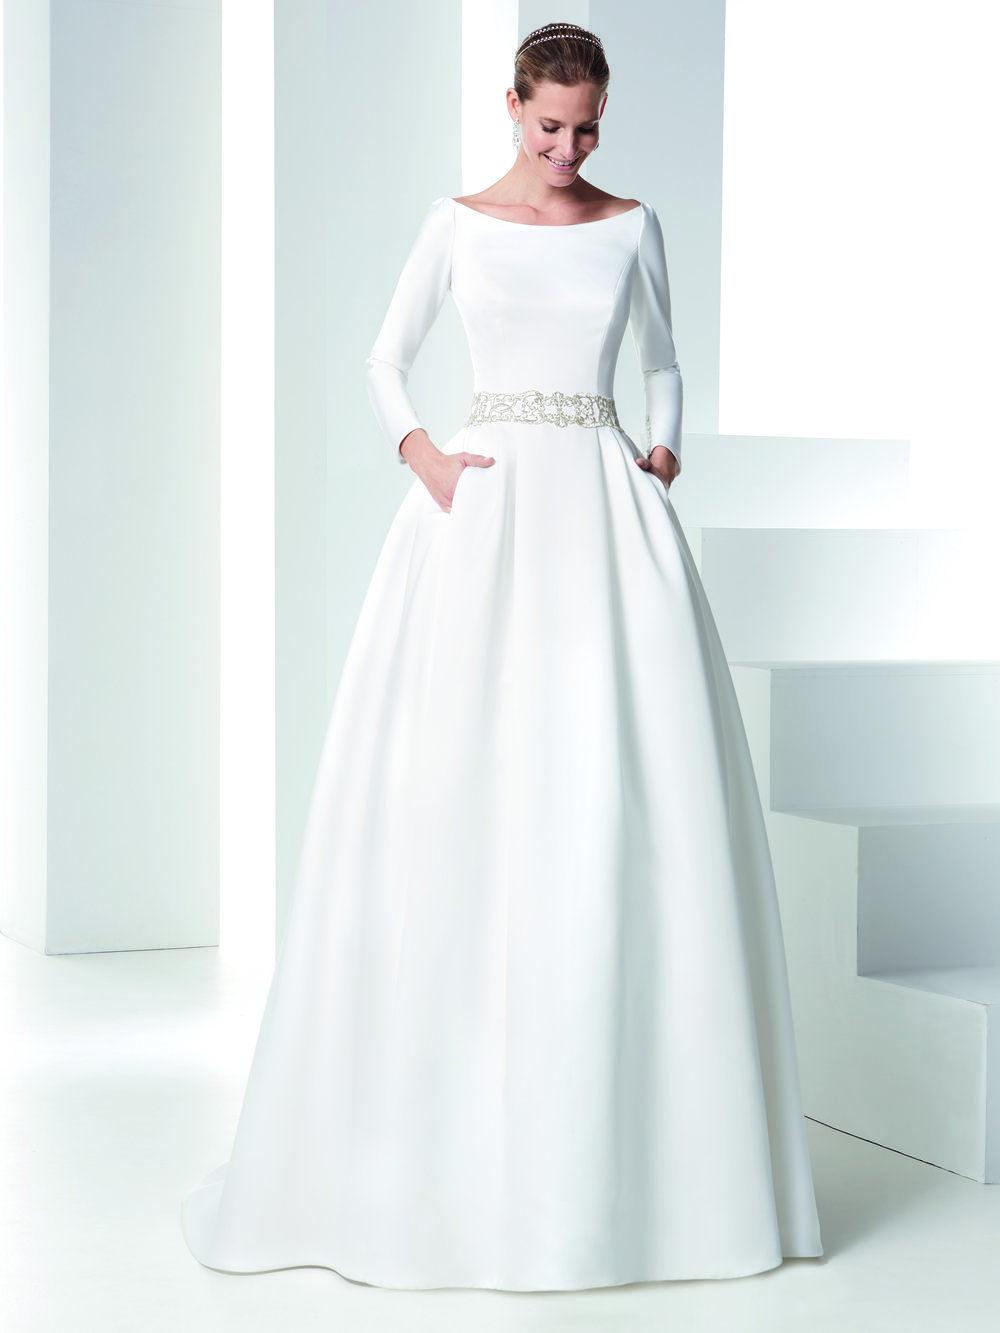 Raimon Bundo — Indianapolis, IN Bridal Store & Wedding